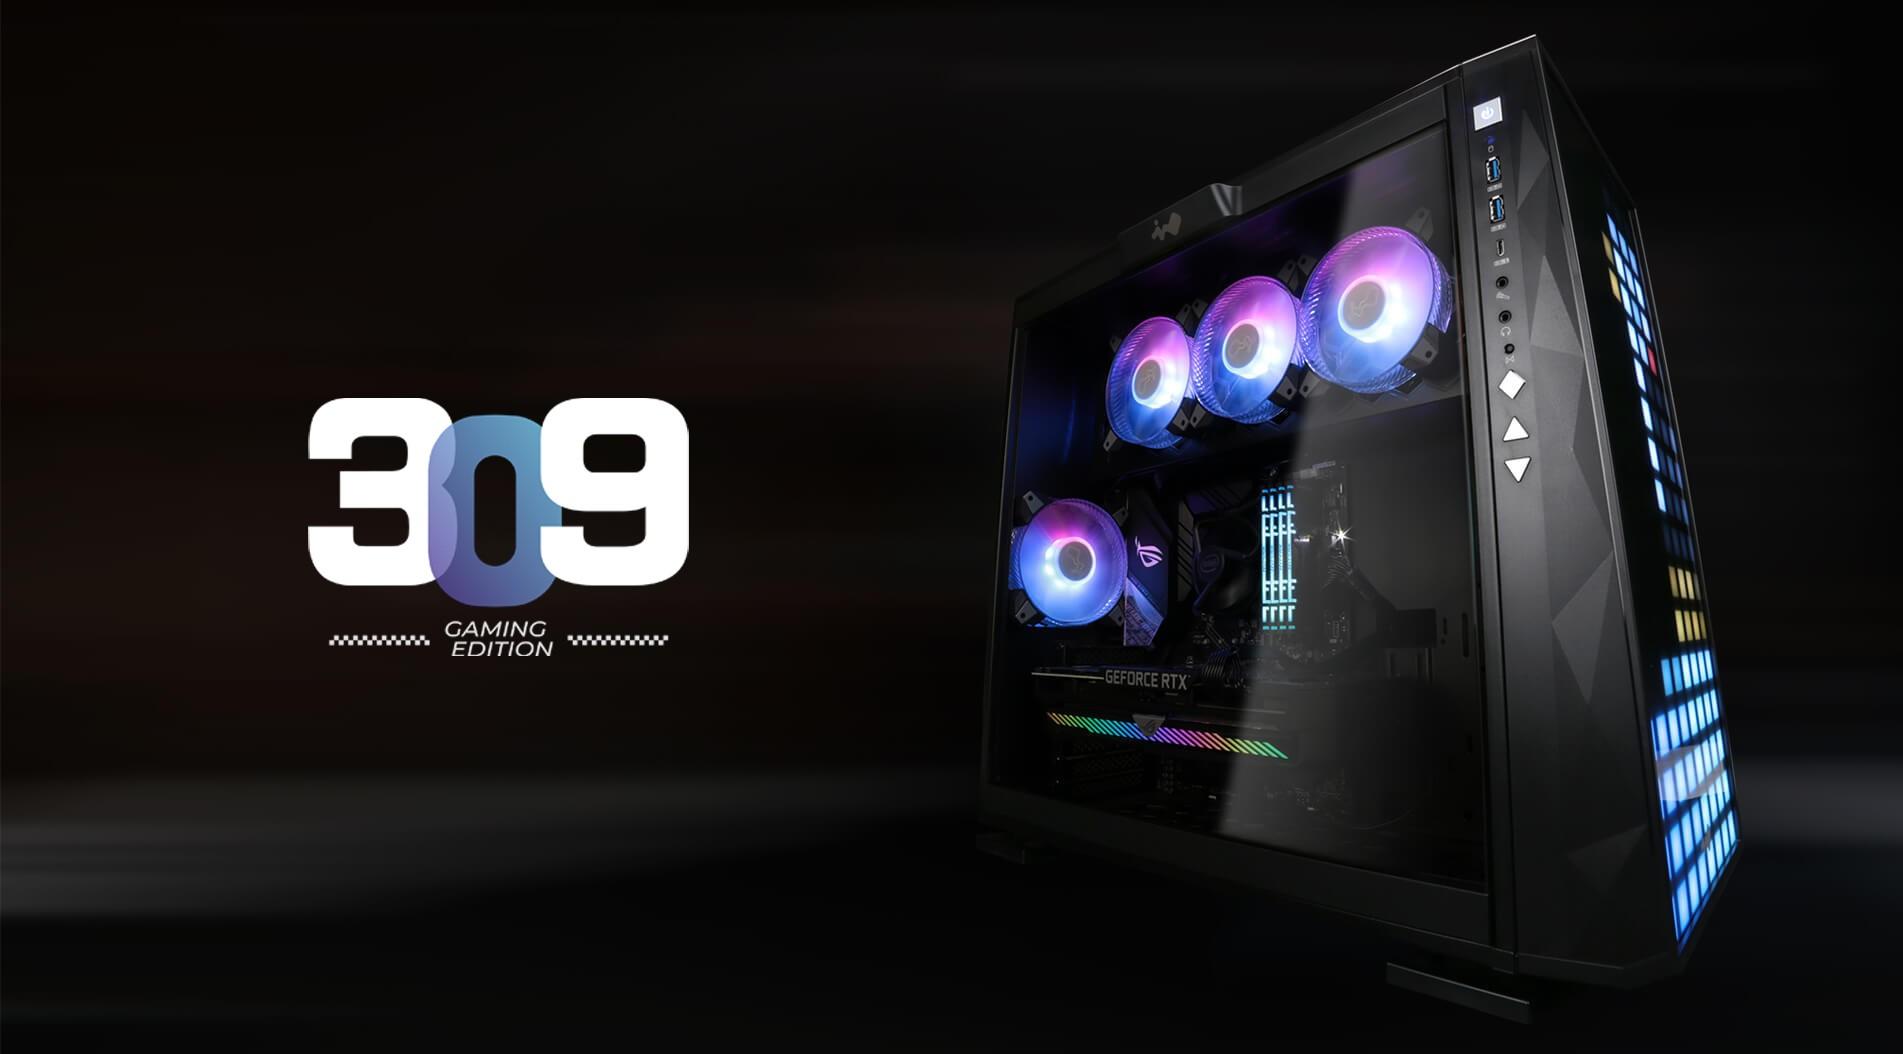 309 Gaming Edition